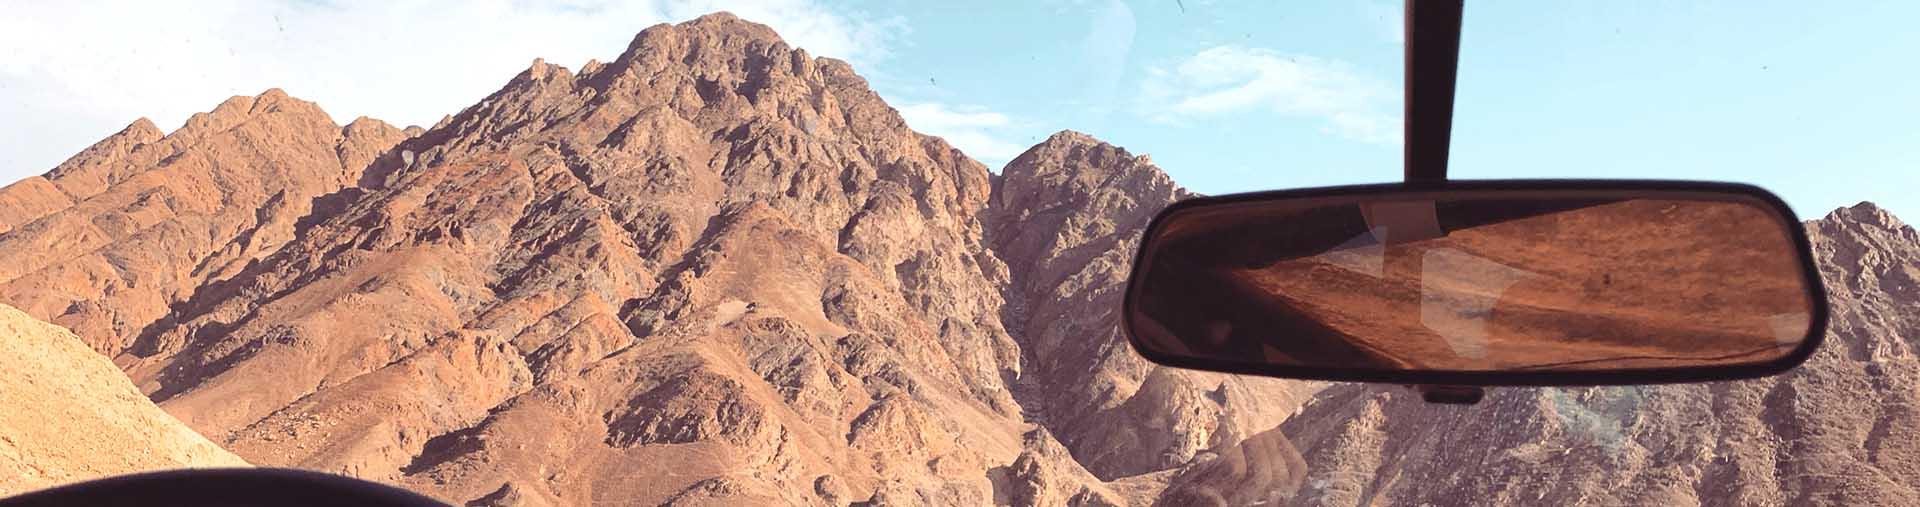 eilat mountains